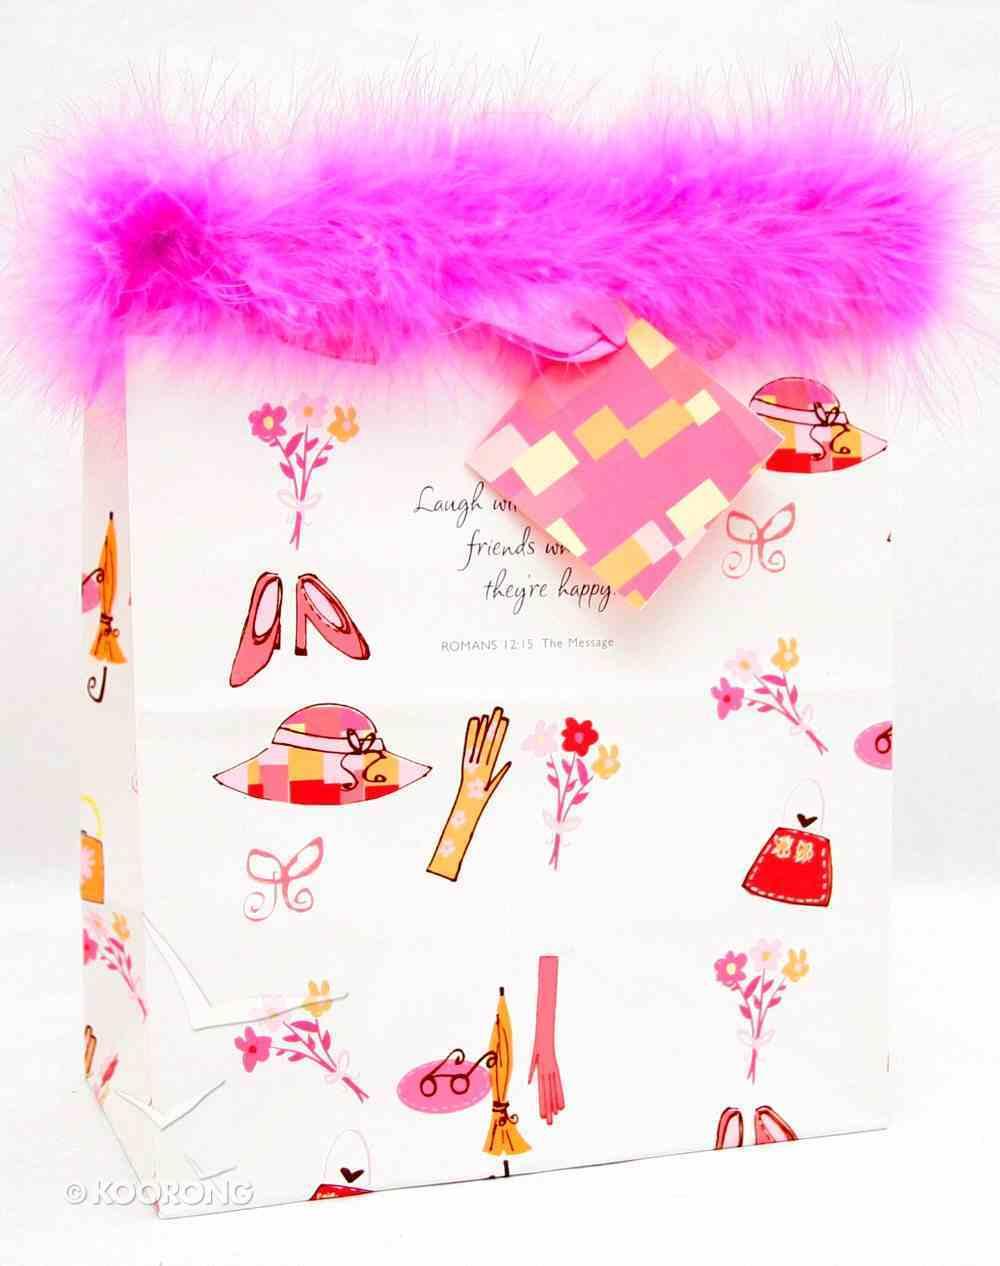 Gift Bag Medium: Pink Fluffy Romans 12:15 (Incl Tissue) Stationery